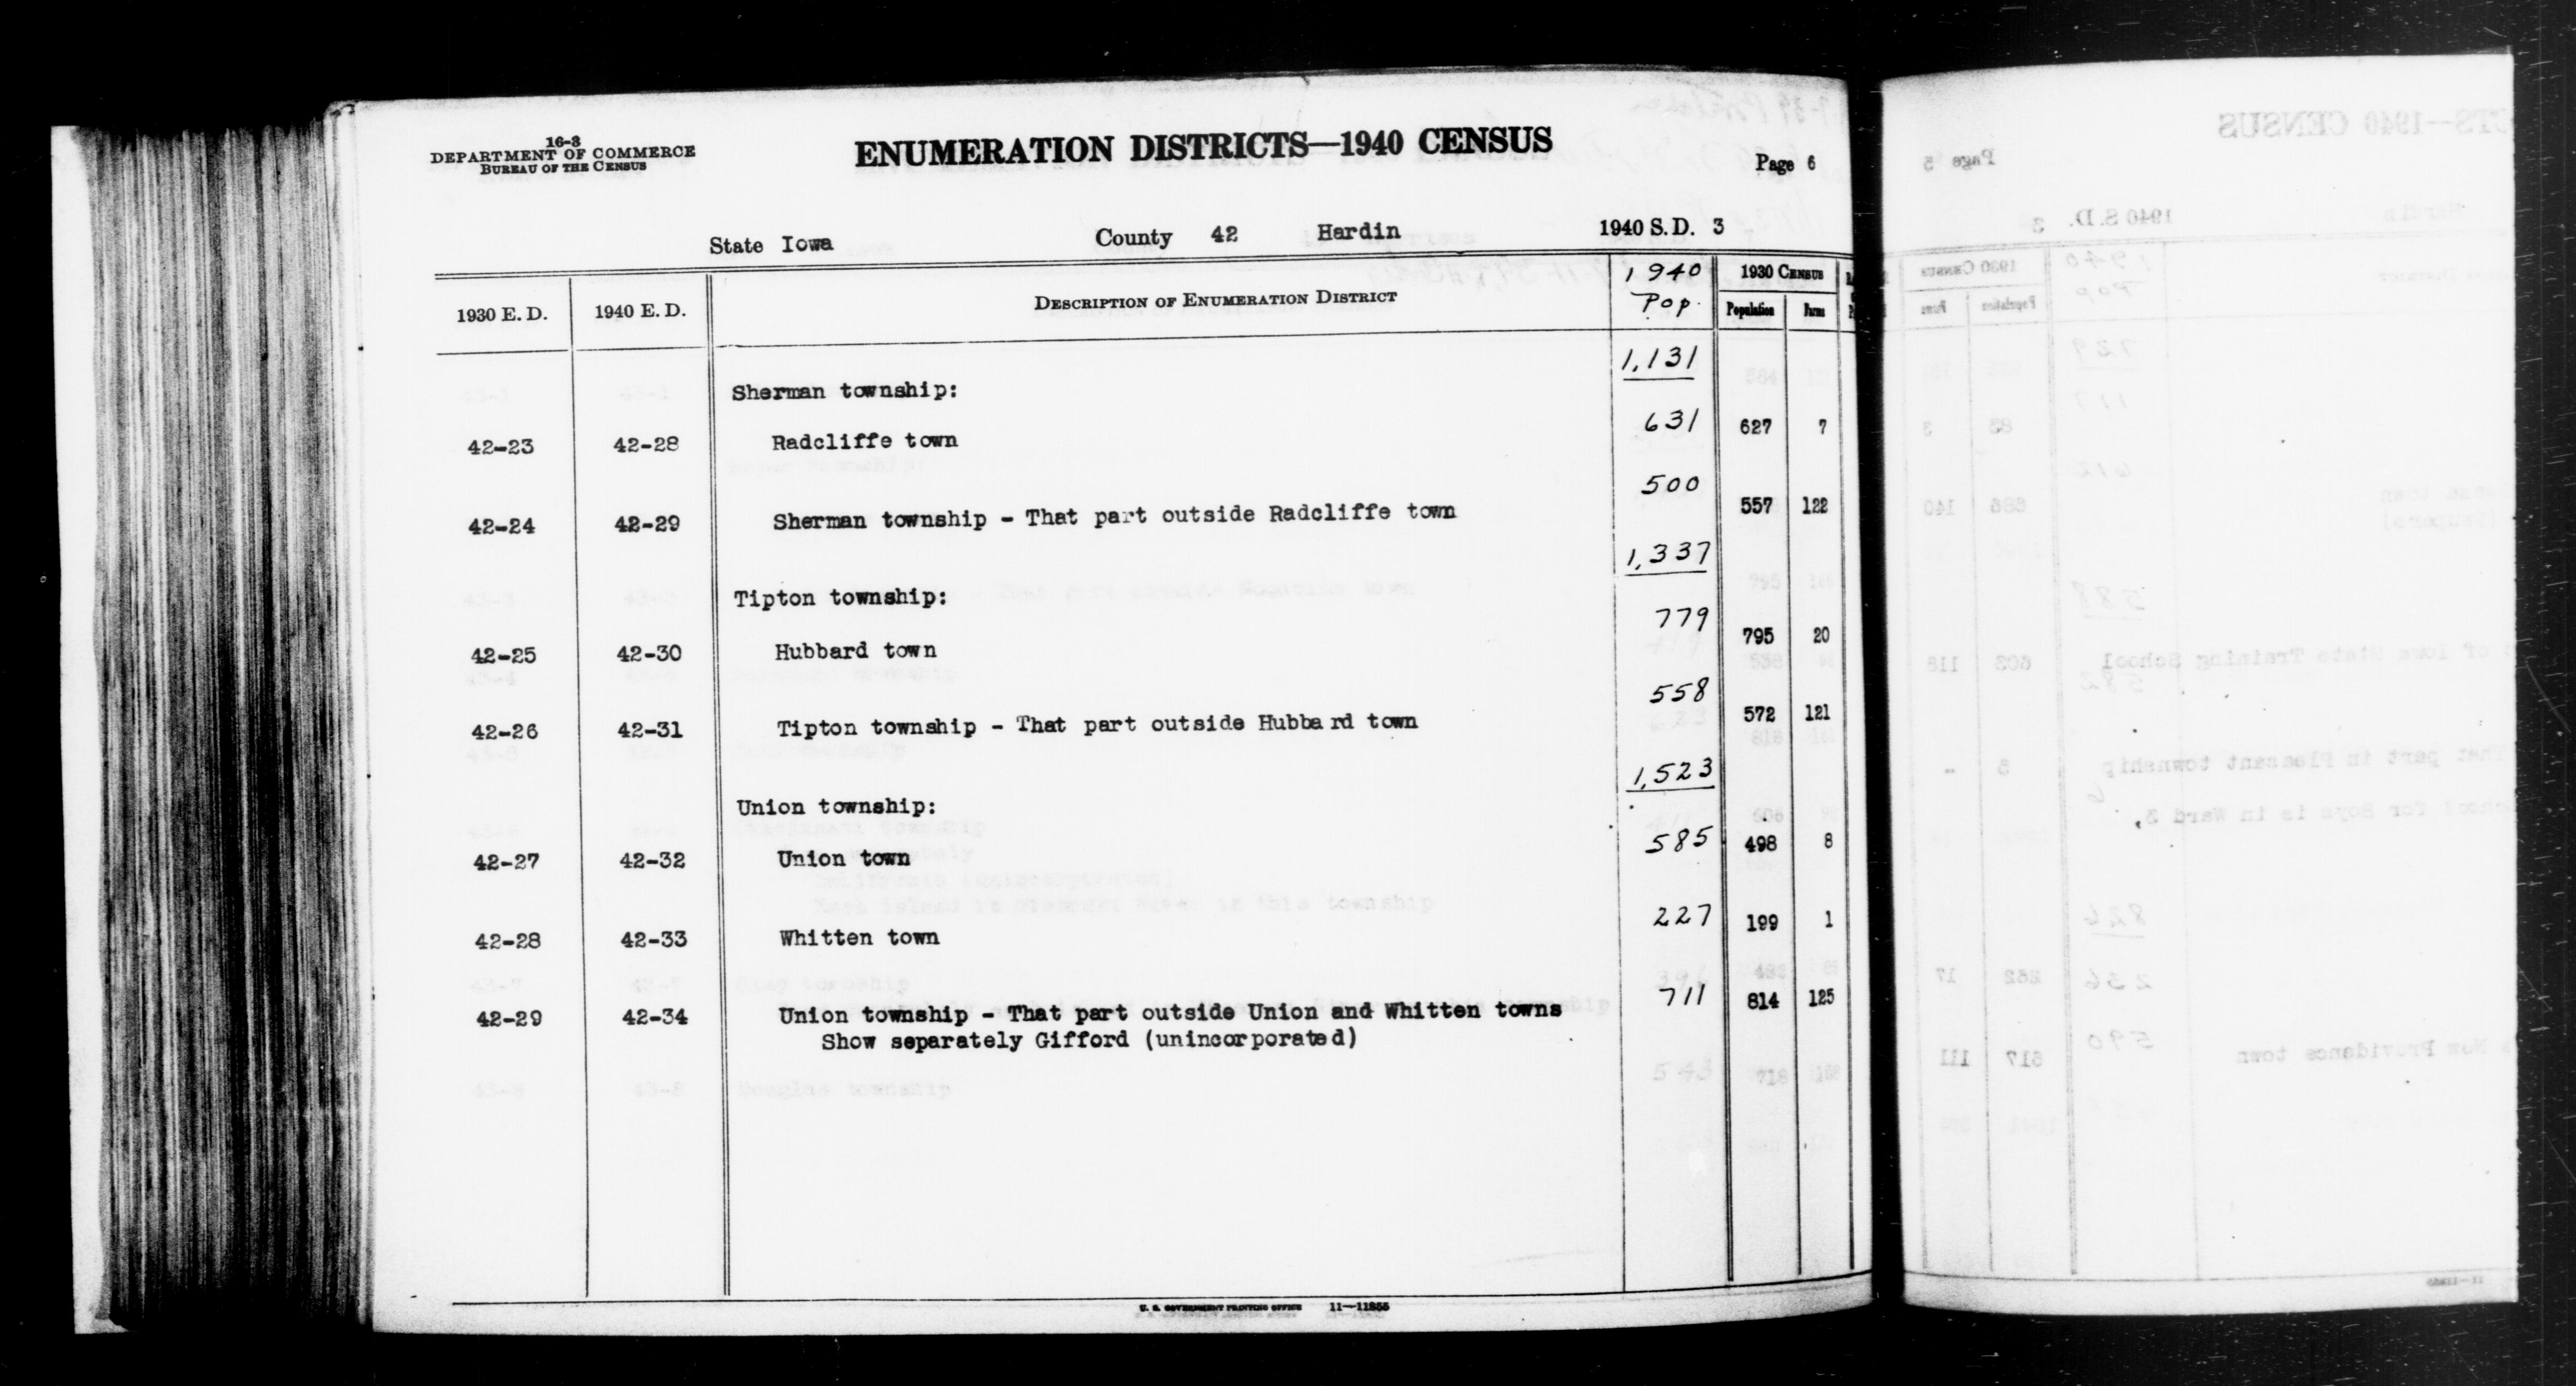 1940 Census Enumeration District Descriptions - Iowa - Hardin County - ED 42-28, ED 42-29, ED 42-30, ED 42-31, ED 42-32, ED 42-33, ED 42-34